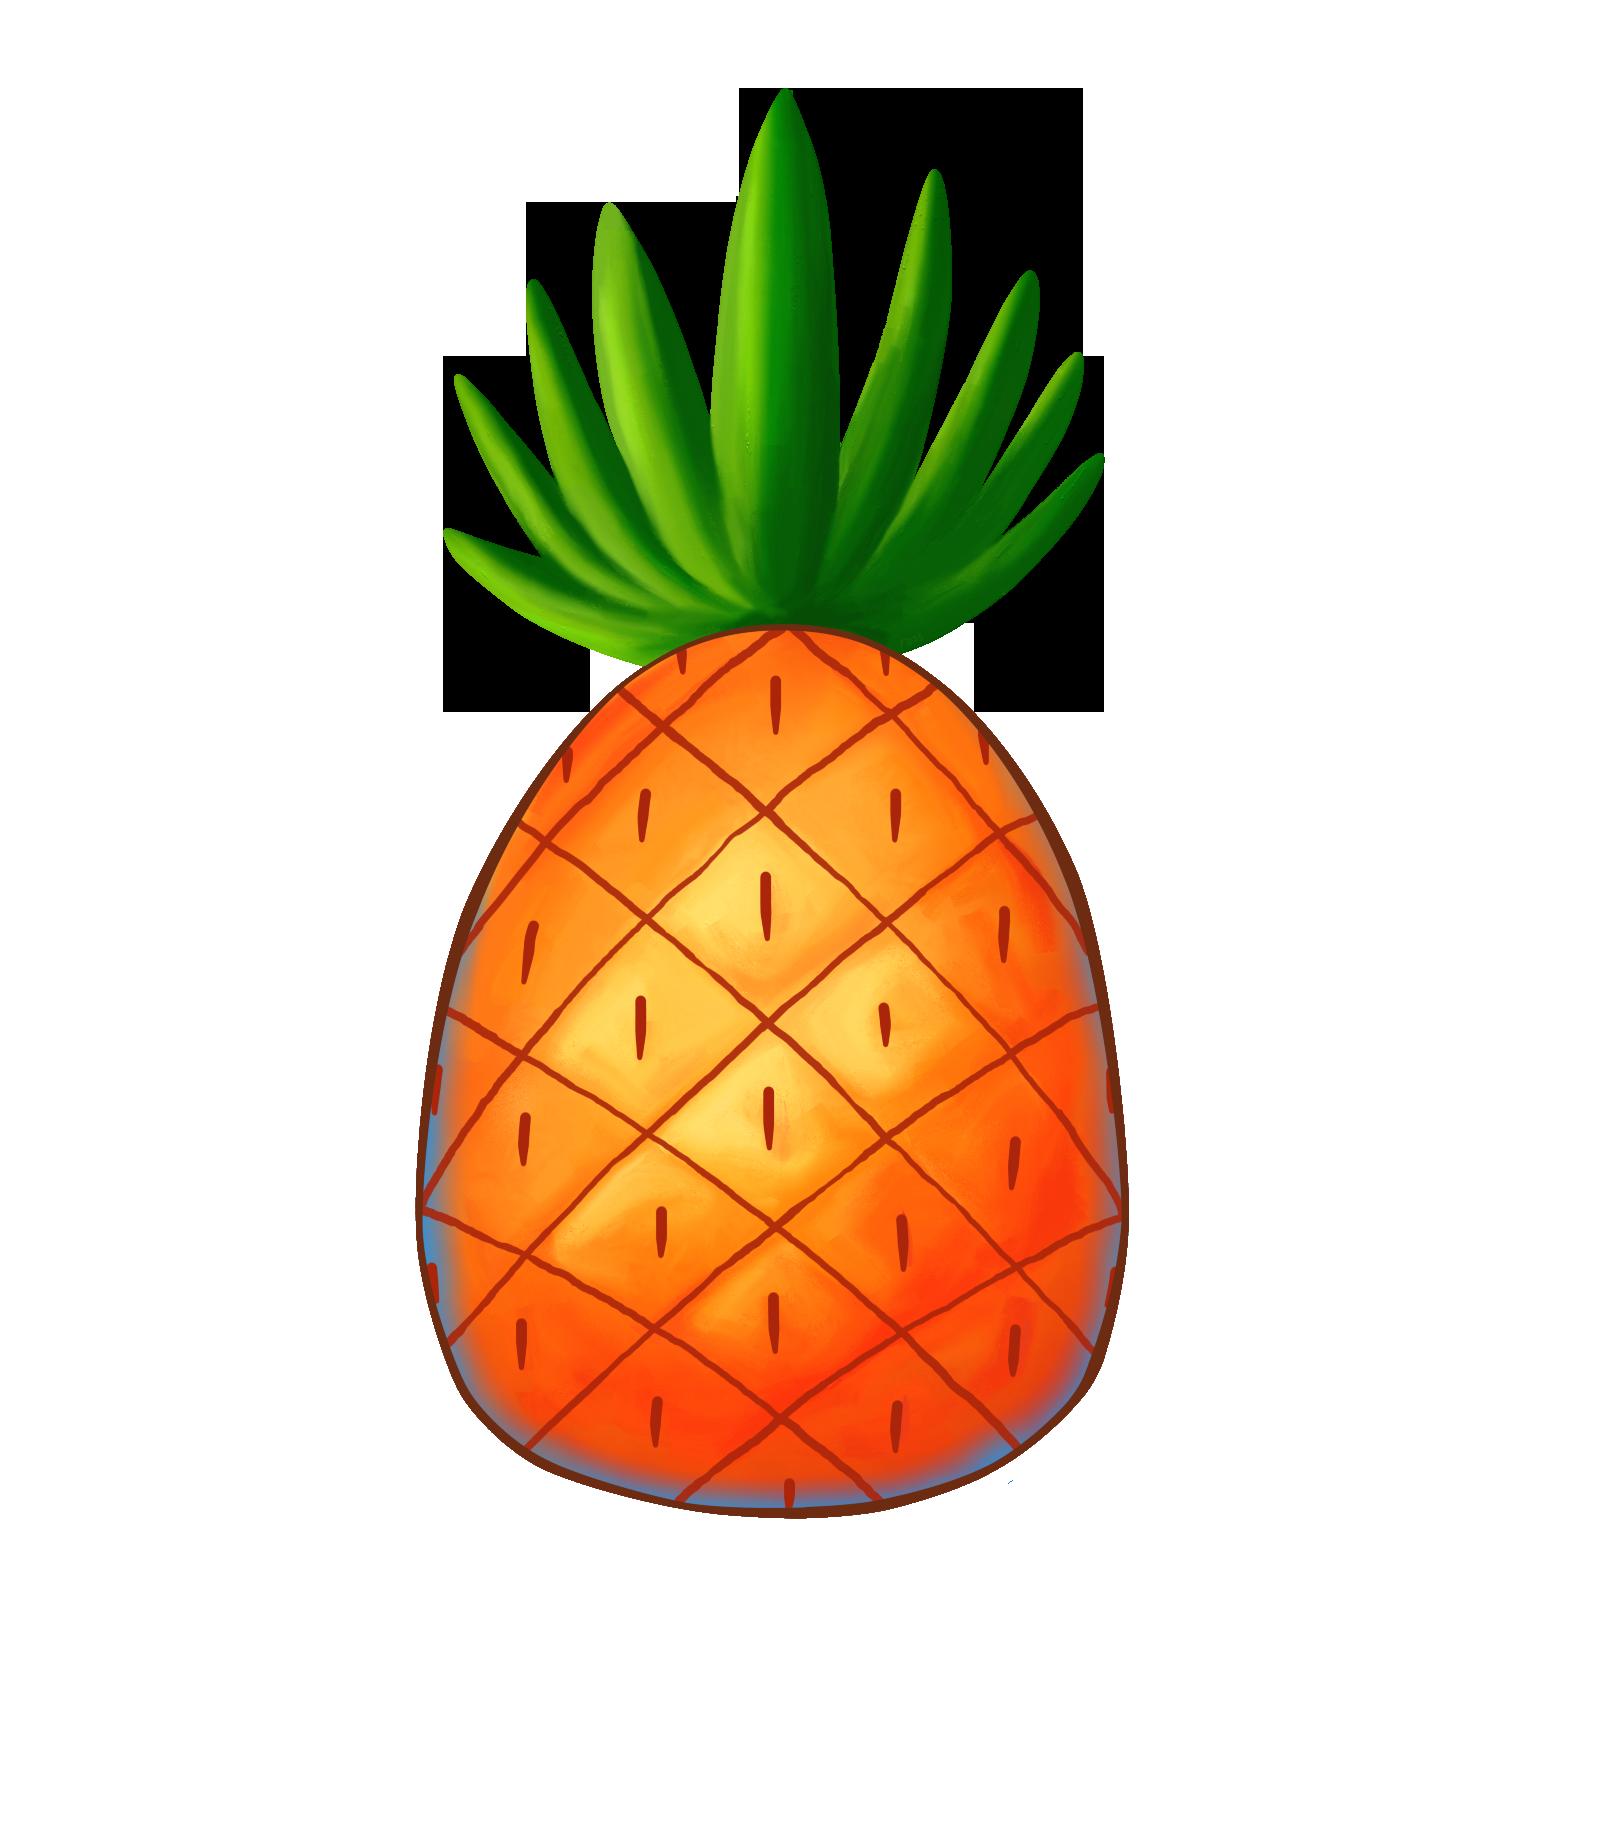 Clipart pineapple sticker, Clipart pineapple sticker.